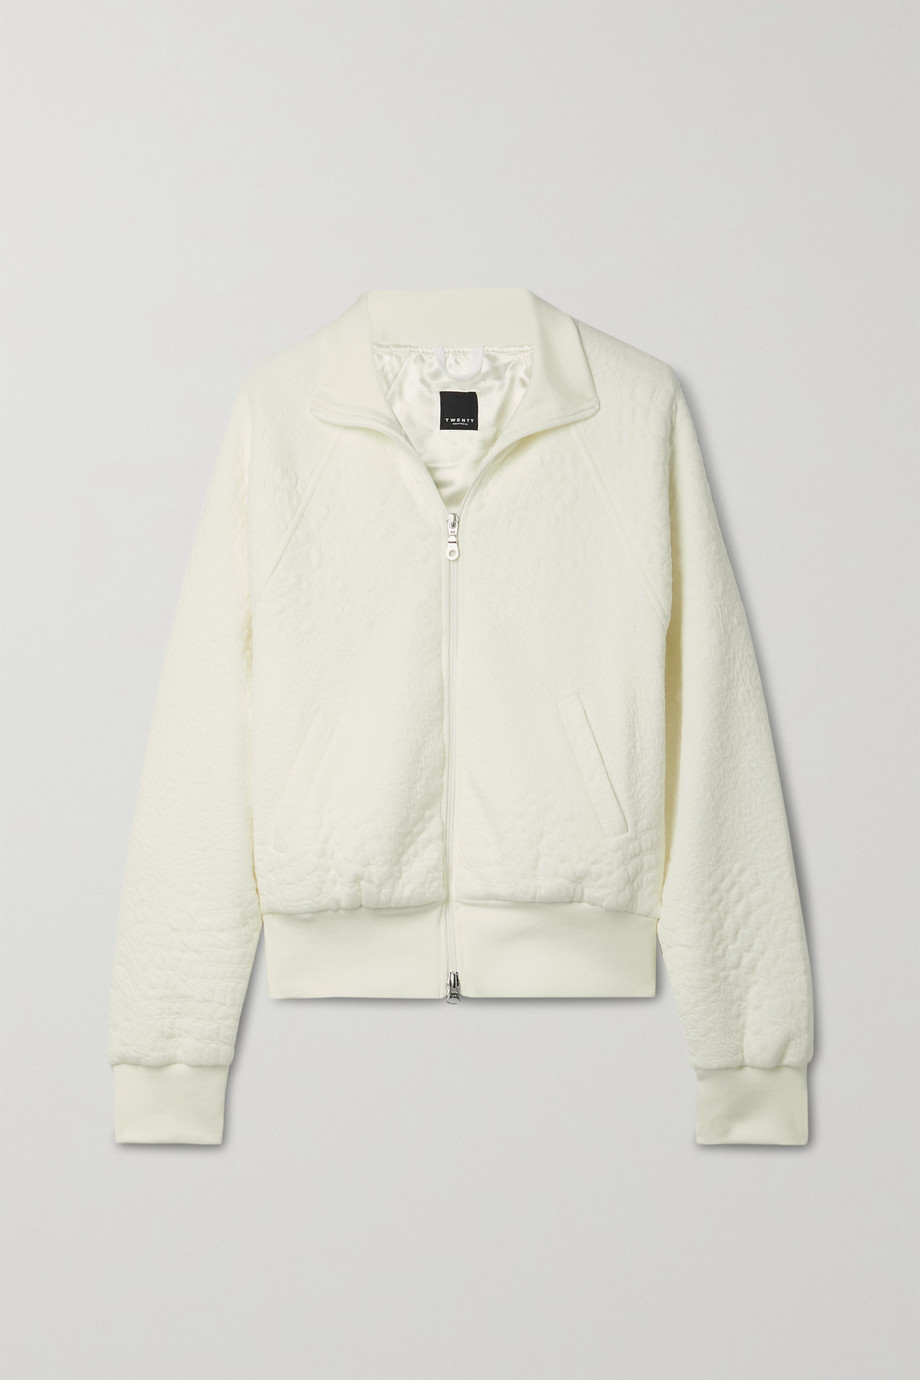 TWENTY Montréal Caiman textured-jersey bomber jacket